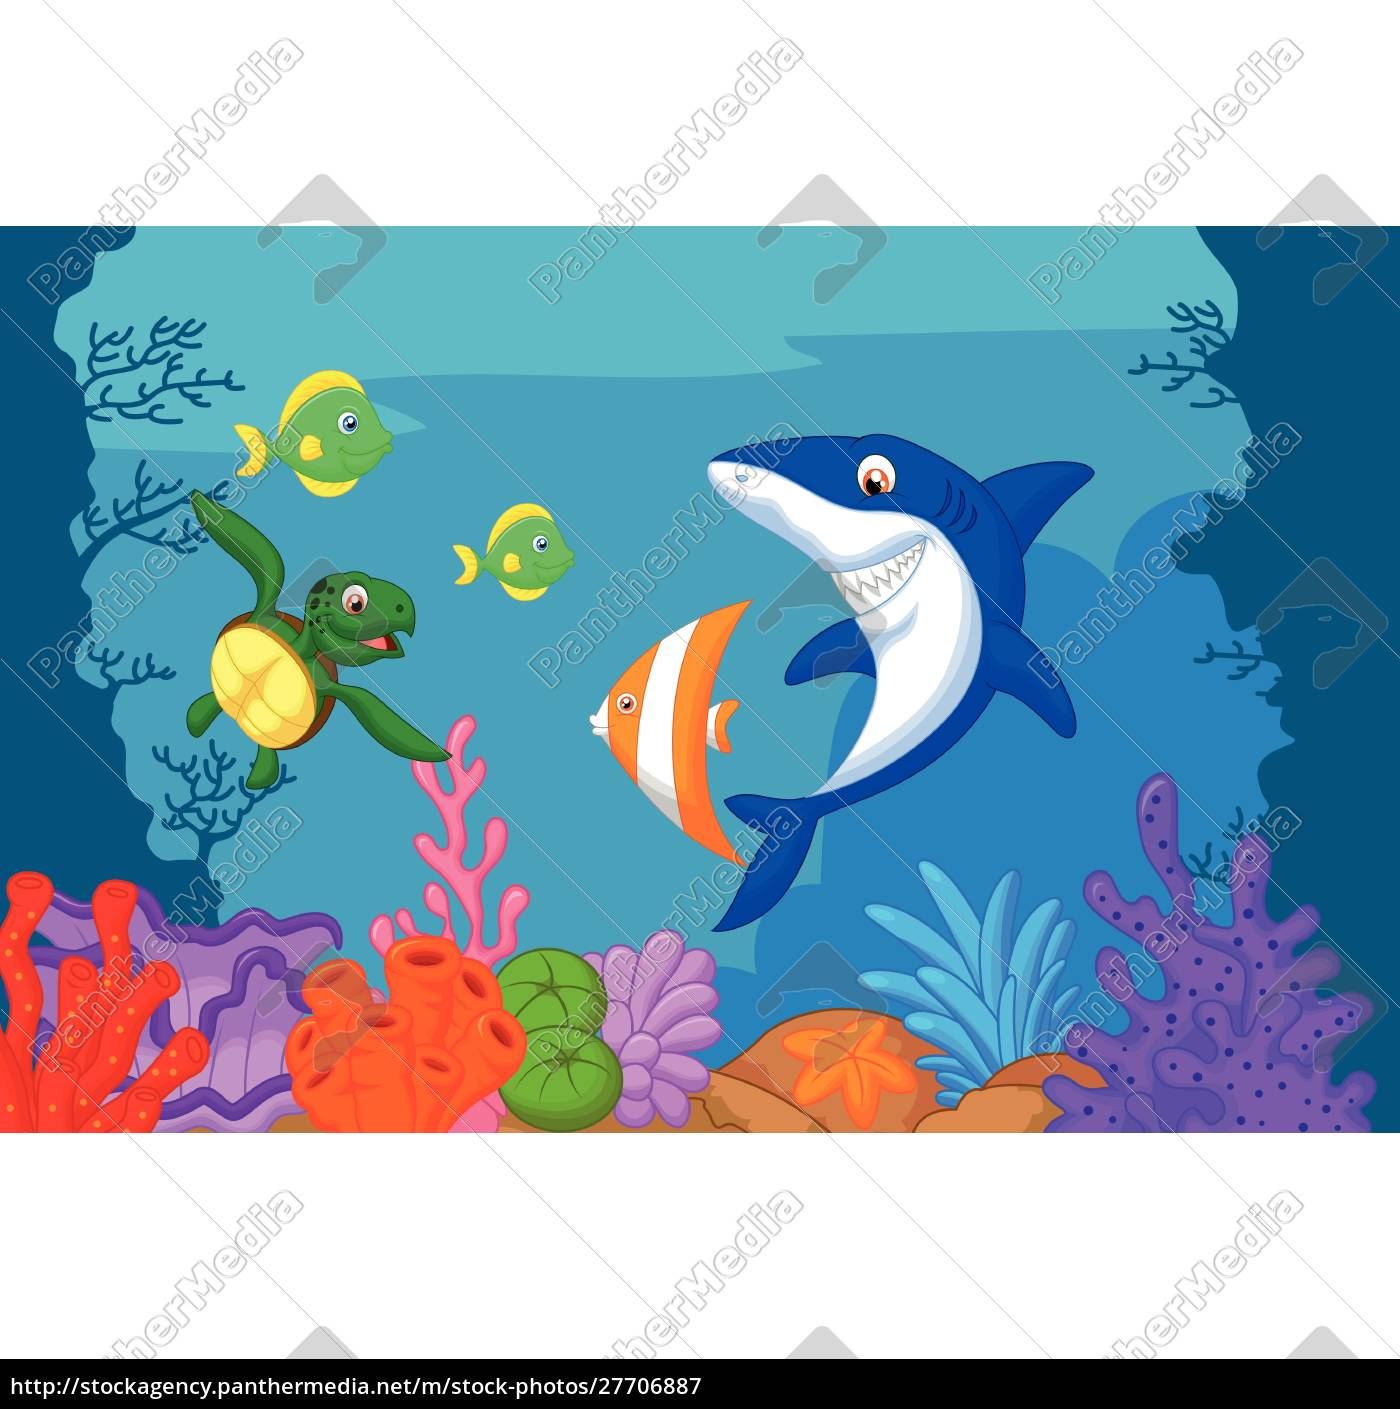 sea, life, cartoon - 27706887